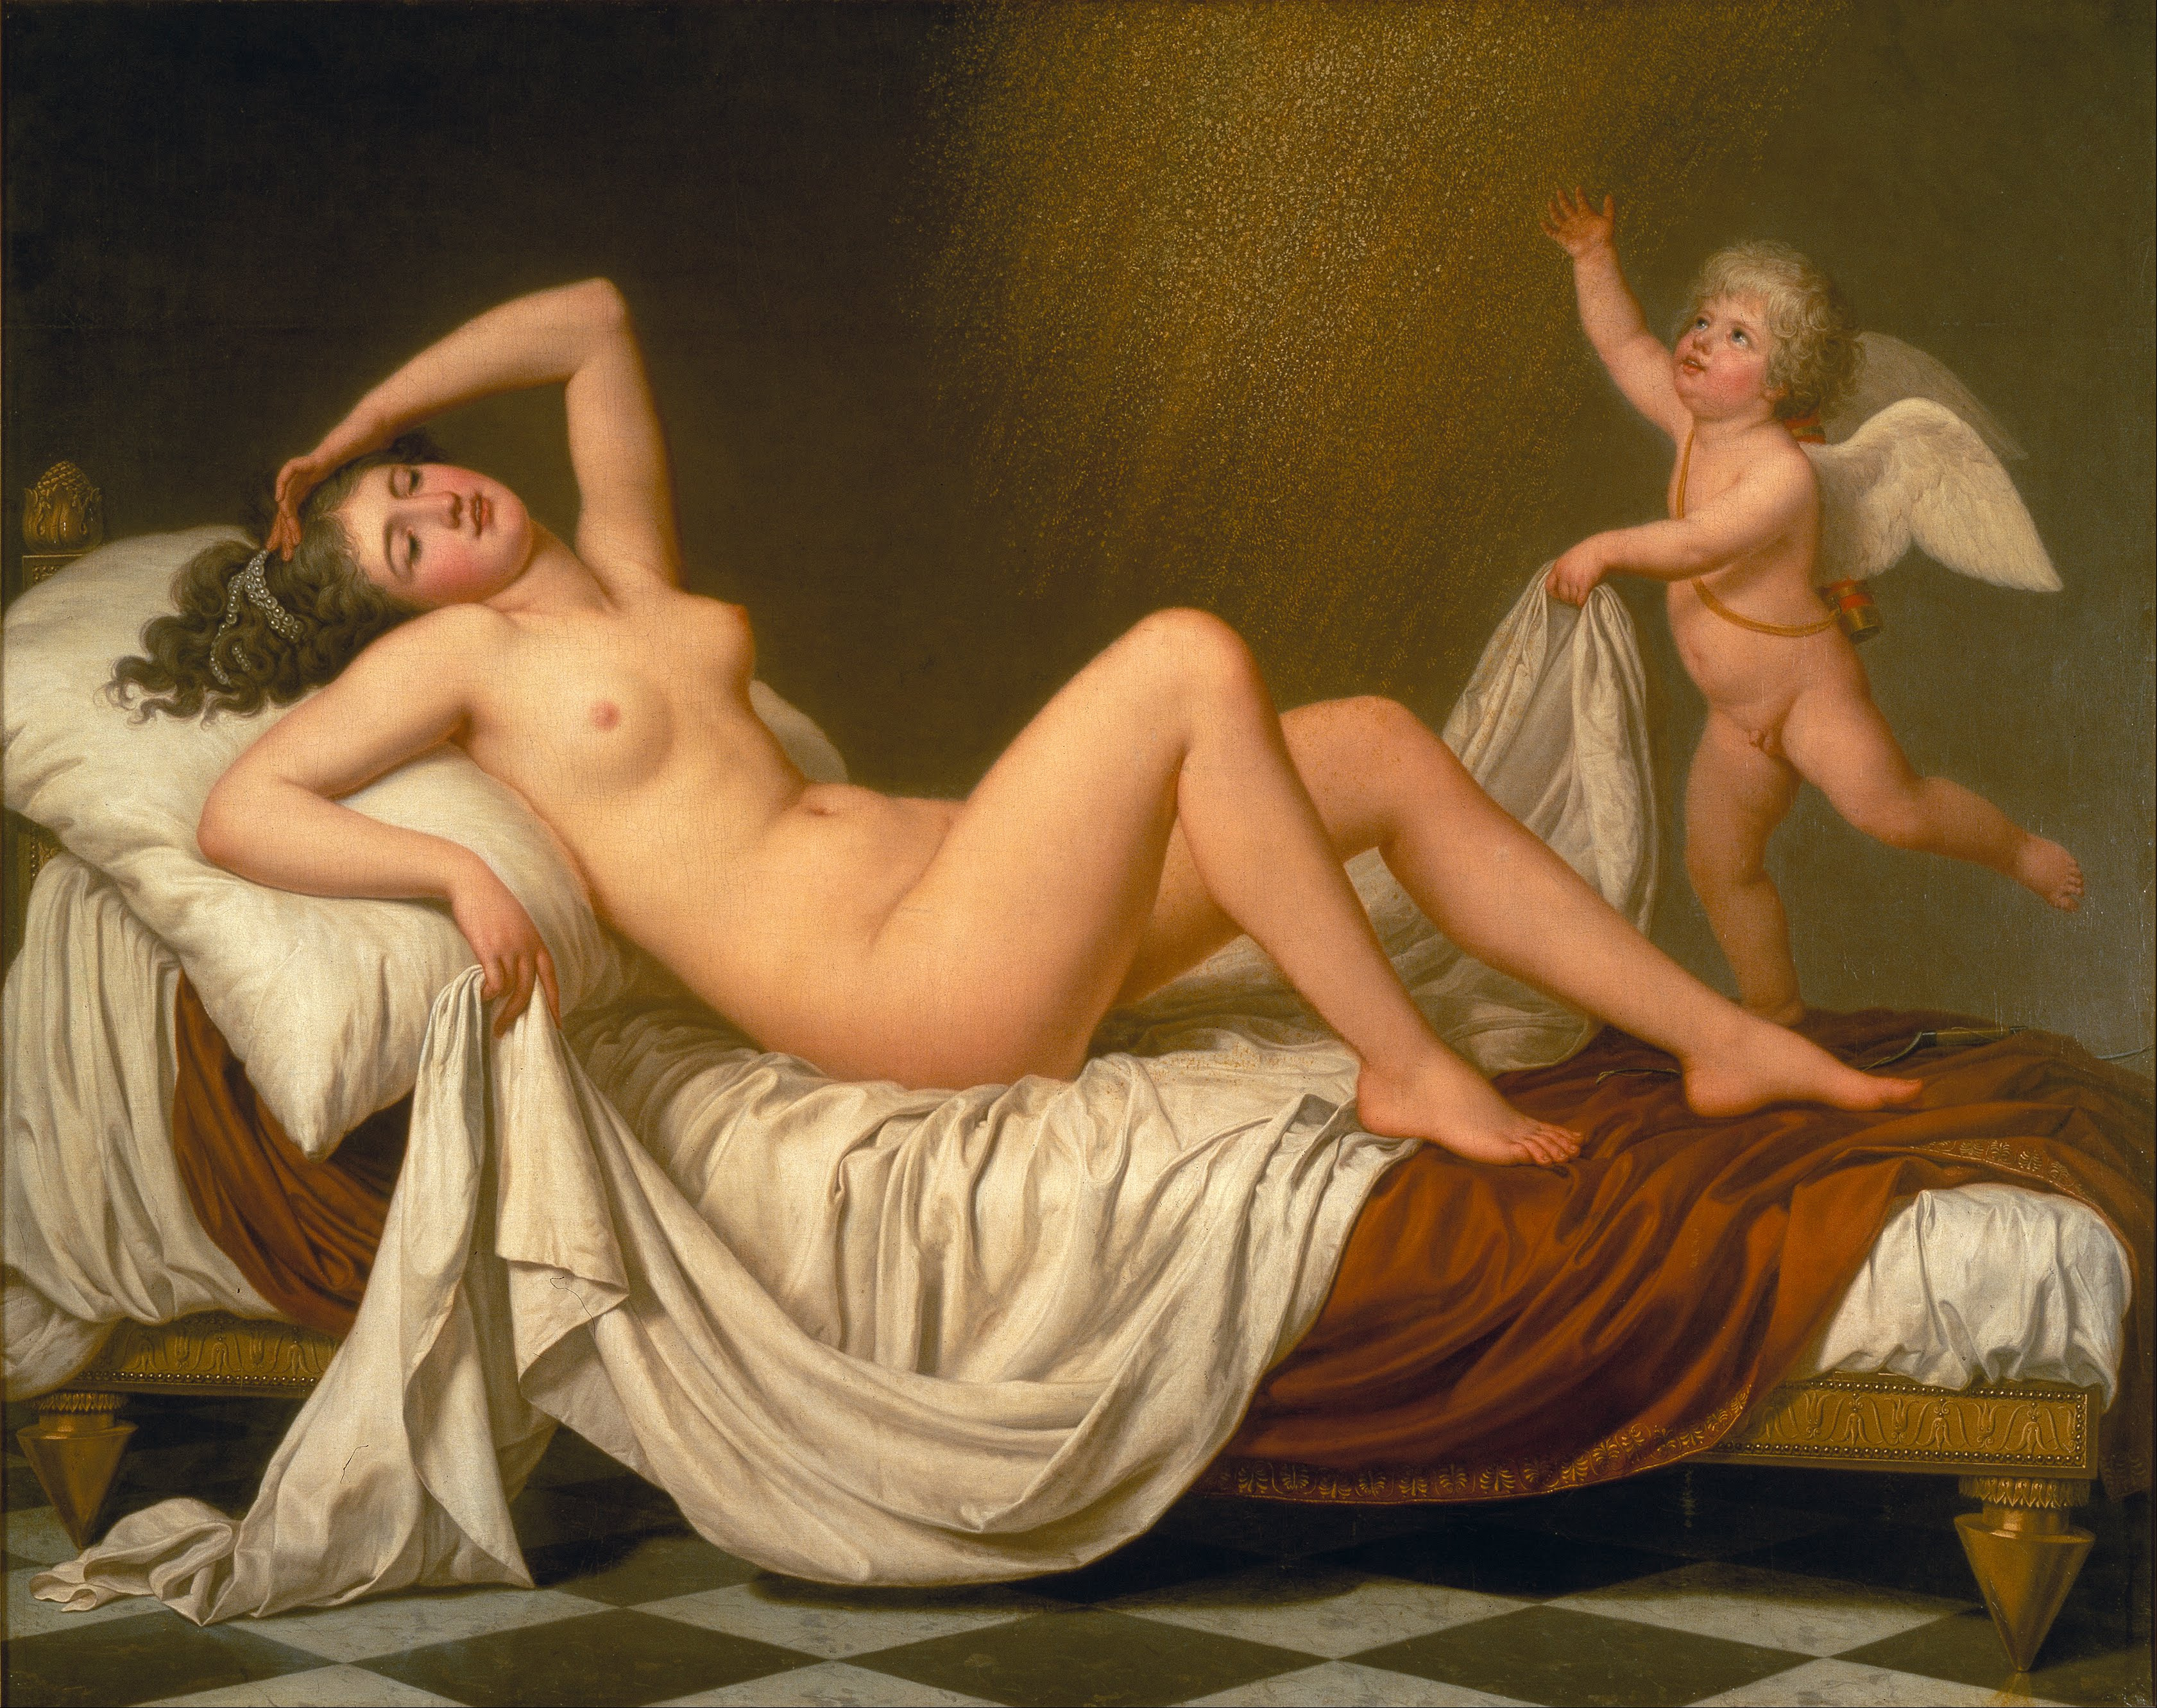 Danaë receiving Jupiter in a Shower of Gold, by Adolf Ulrik Wertmüller (1787)